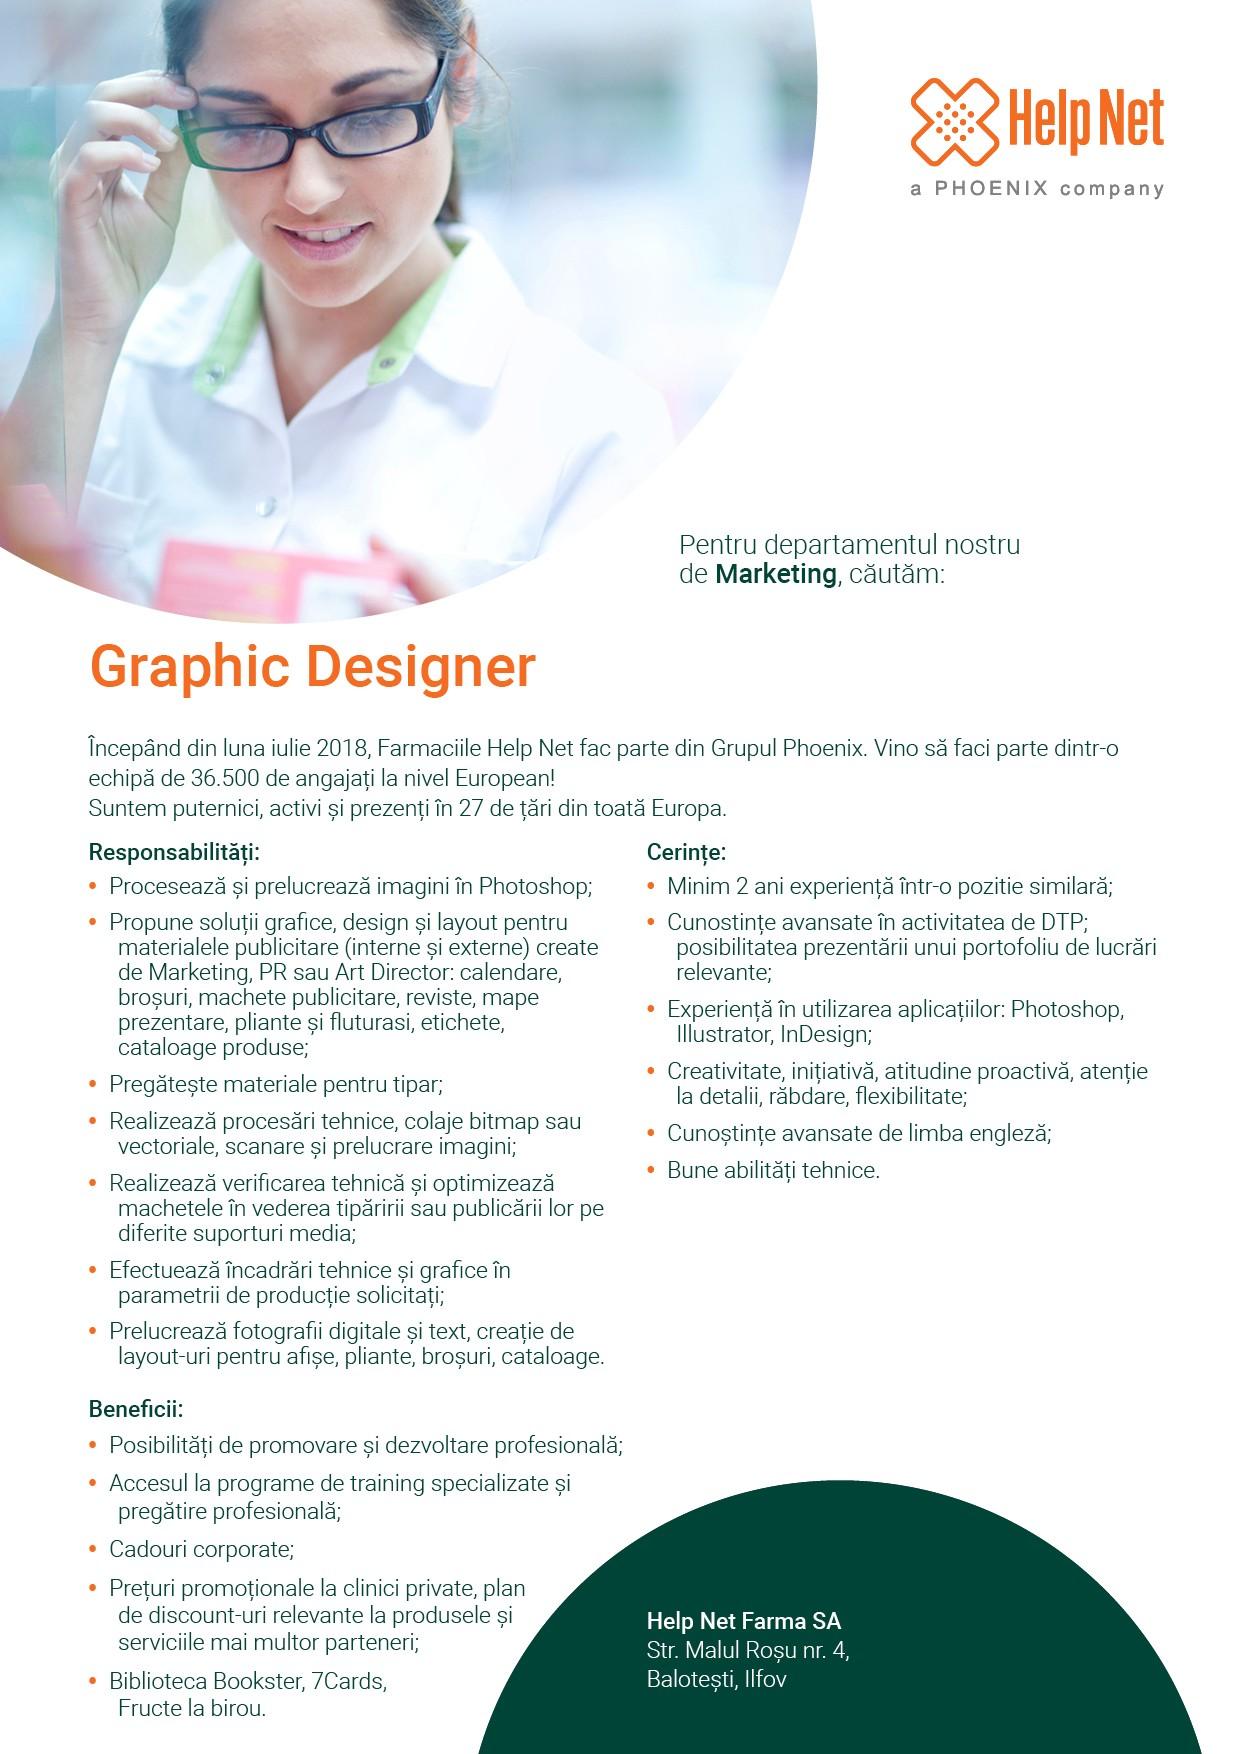 Job Description Graphic Designer